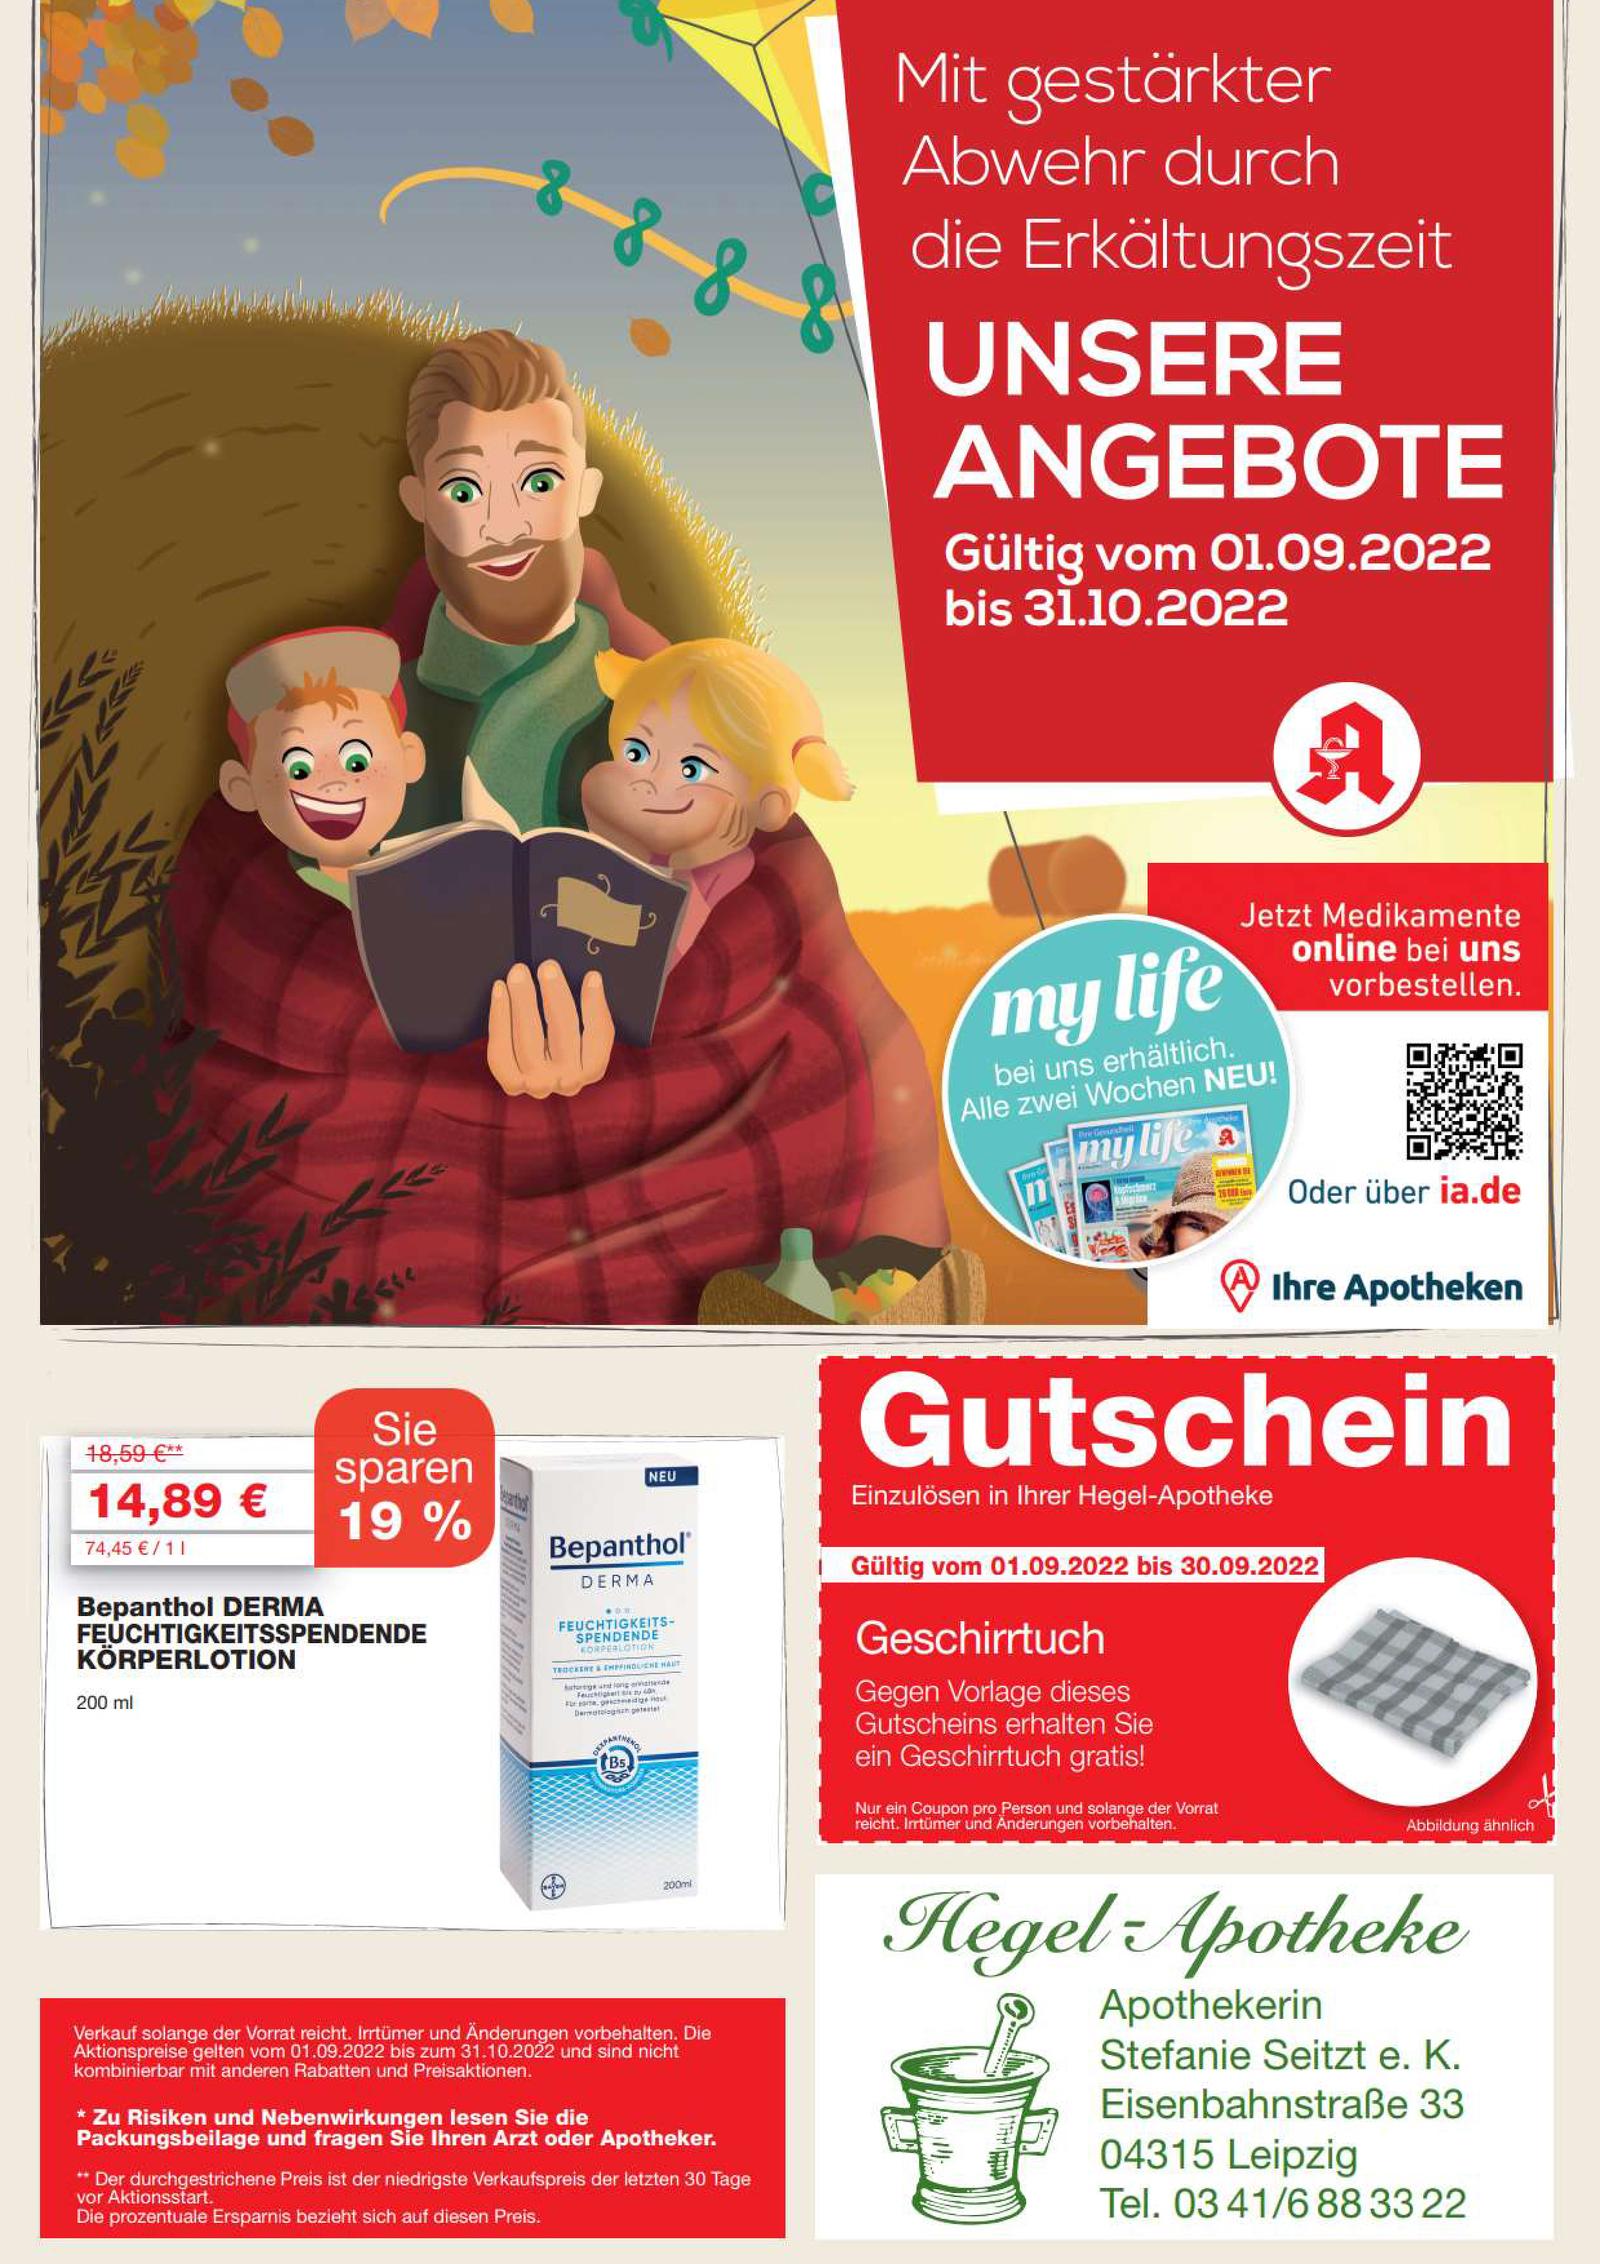 https://mein-uploads.apocdn.net/17168/leaflets/17168_flyer-Seite1.png